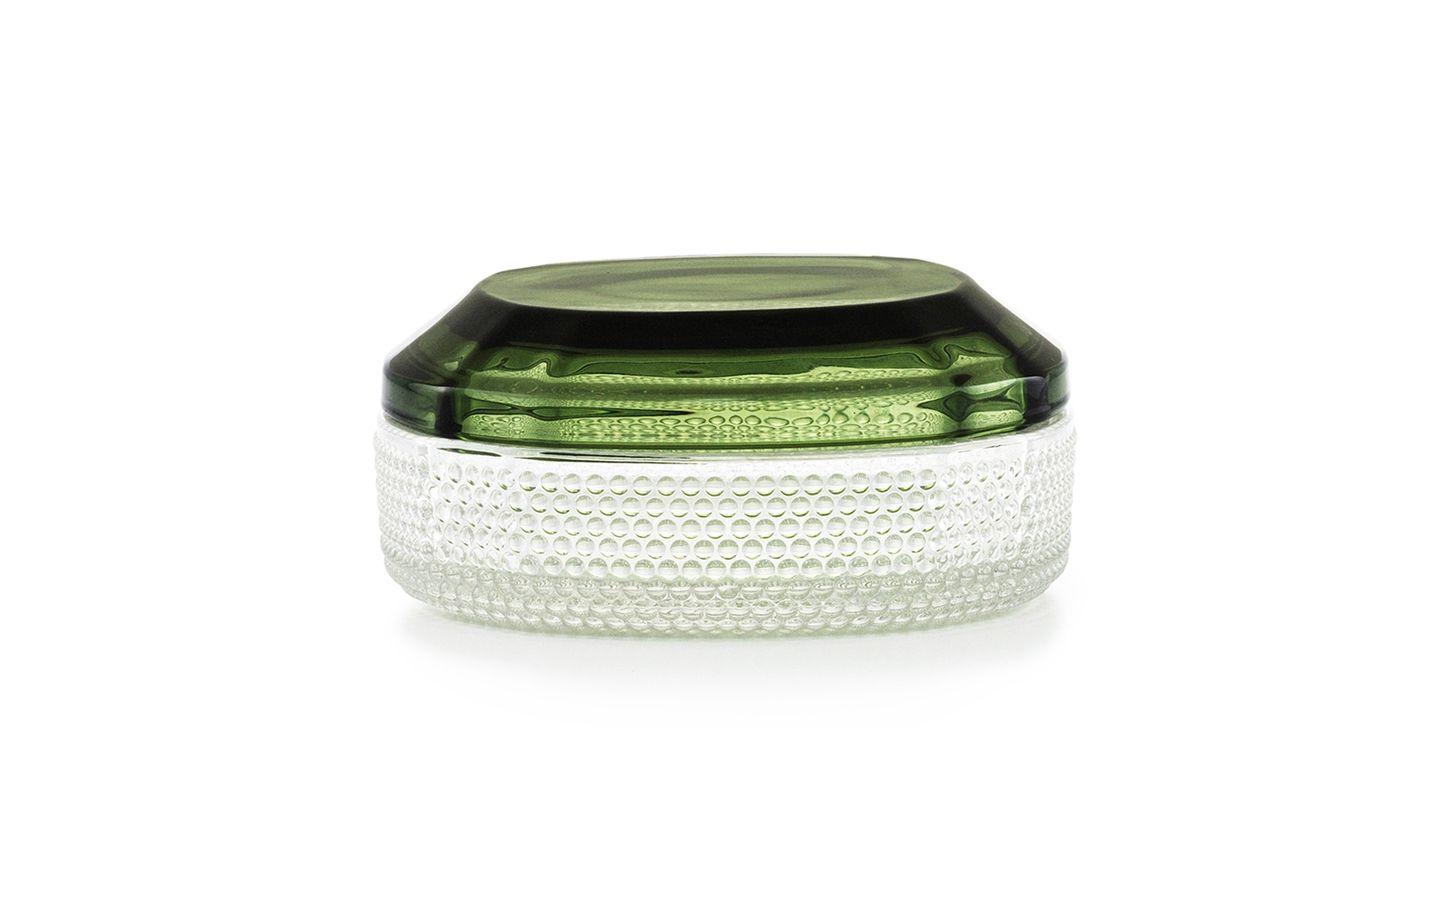 Brilliant Box Large dark green – glass storage boxes inspired by gemstones